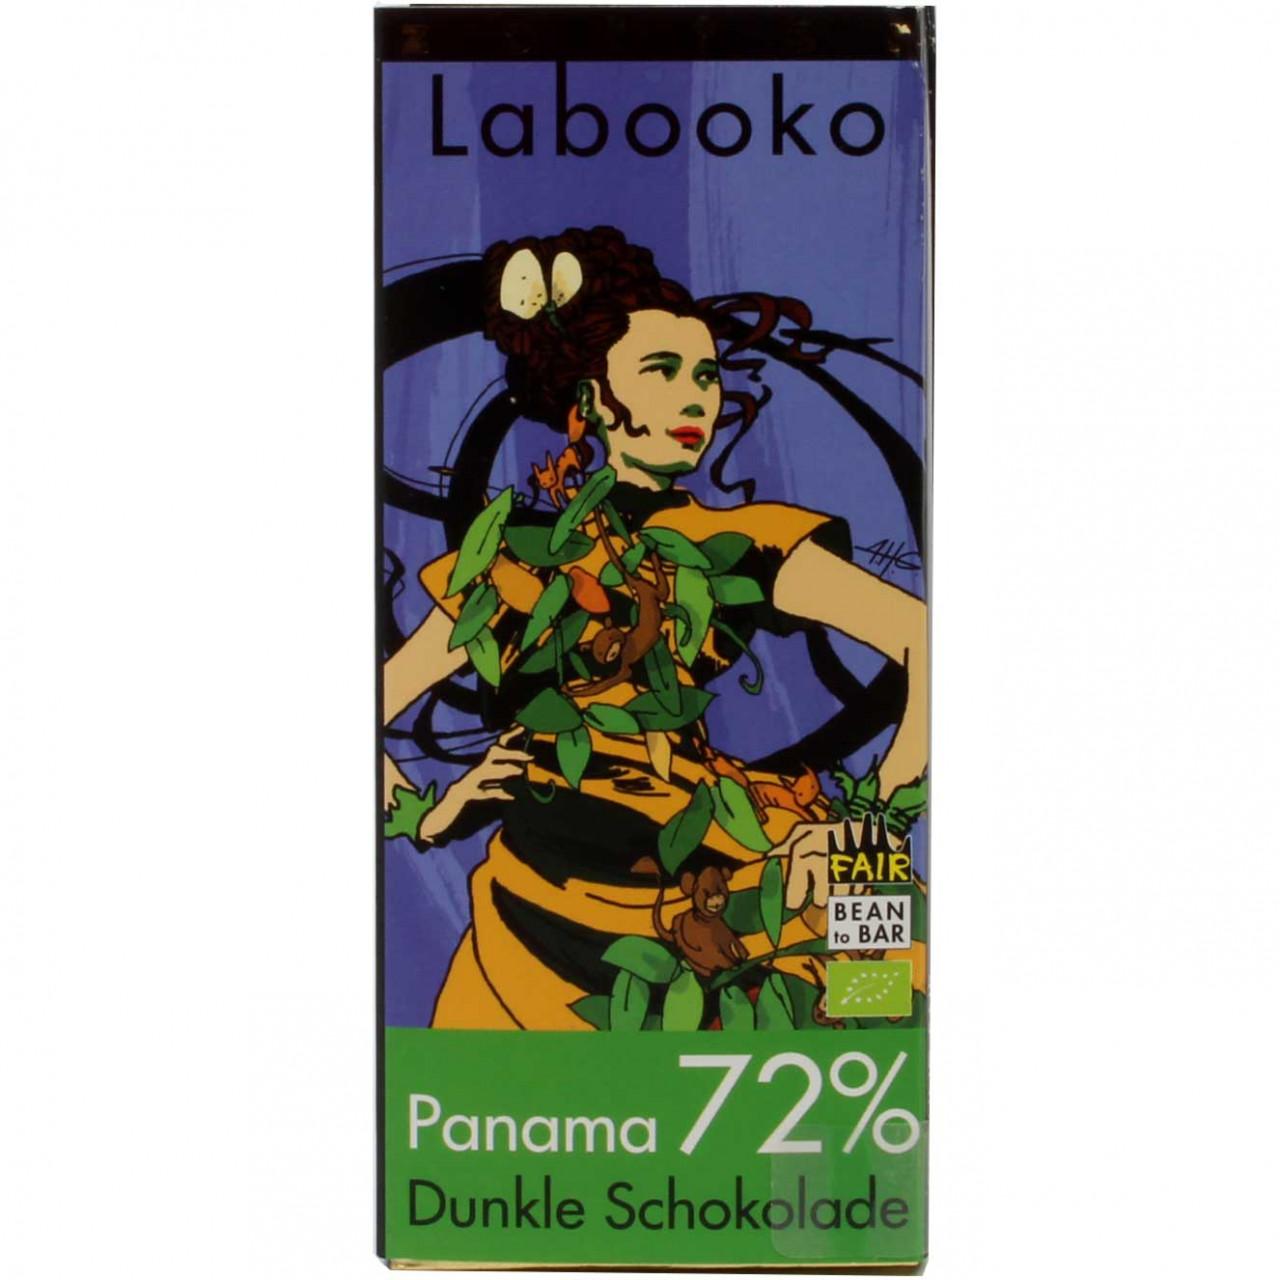 Labooko 72% organic chocolate Panama, vegan - Bar of Chocolate, alcohol free Chocolate, gluten free chocolate, laktose free chocolate, vegan chocolate, Austria, austrian chocolate, Chocolate with sugar - Chocolats-De-Luxe